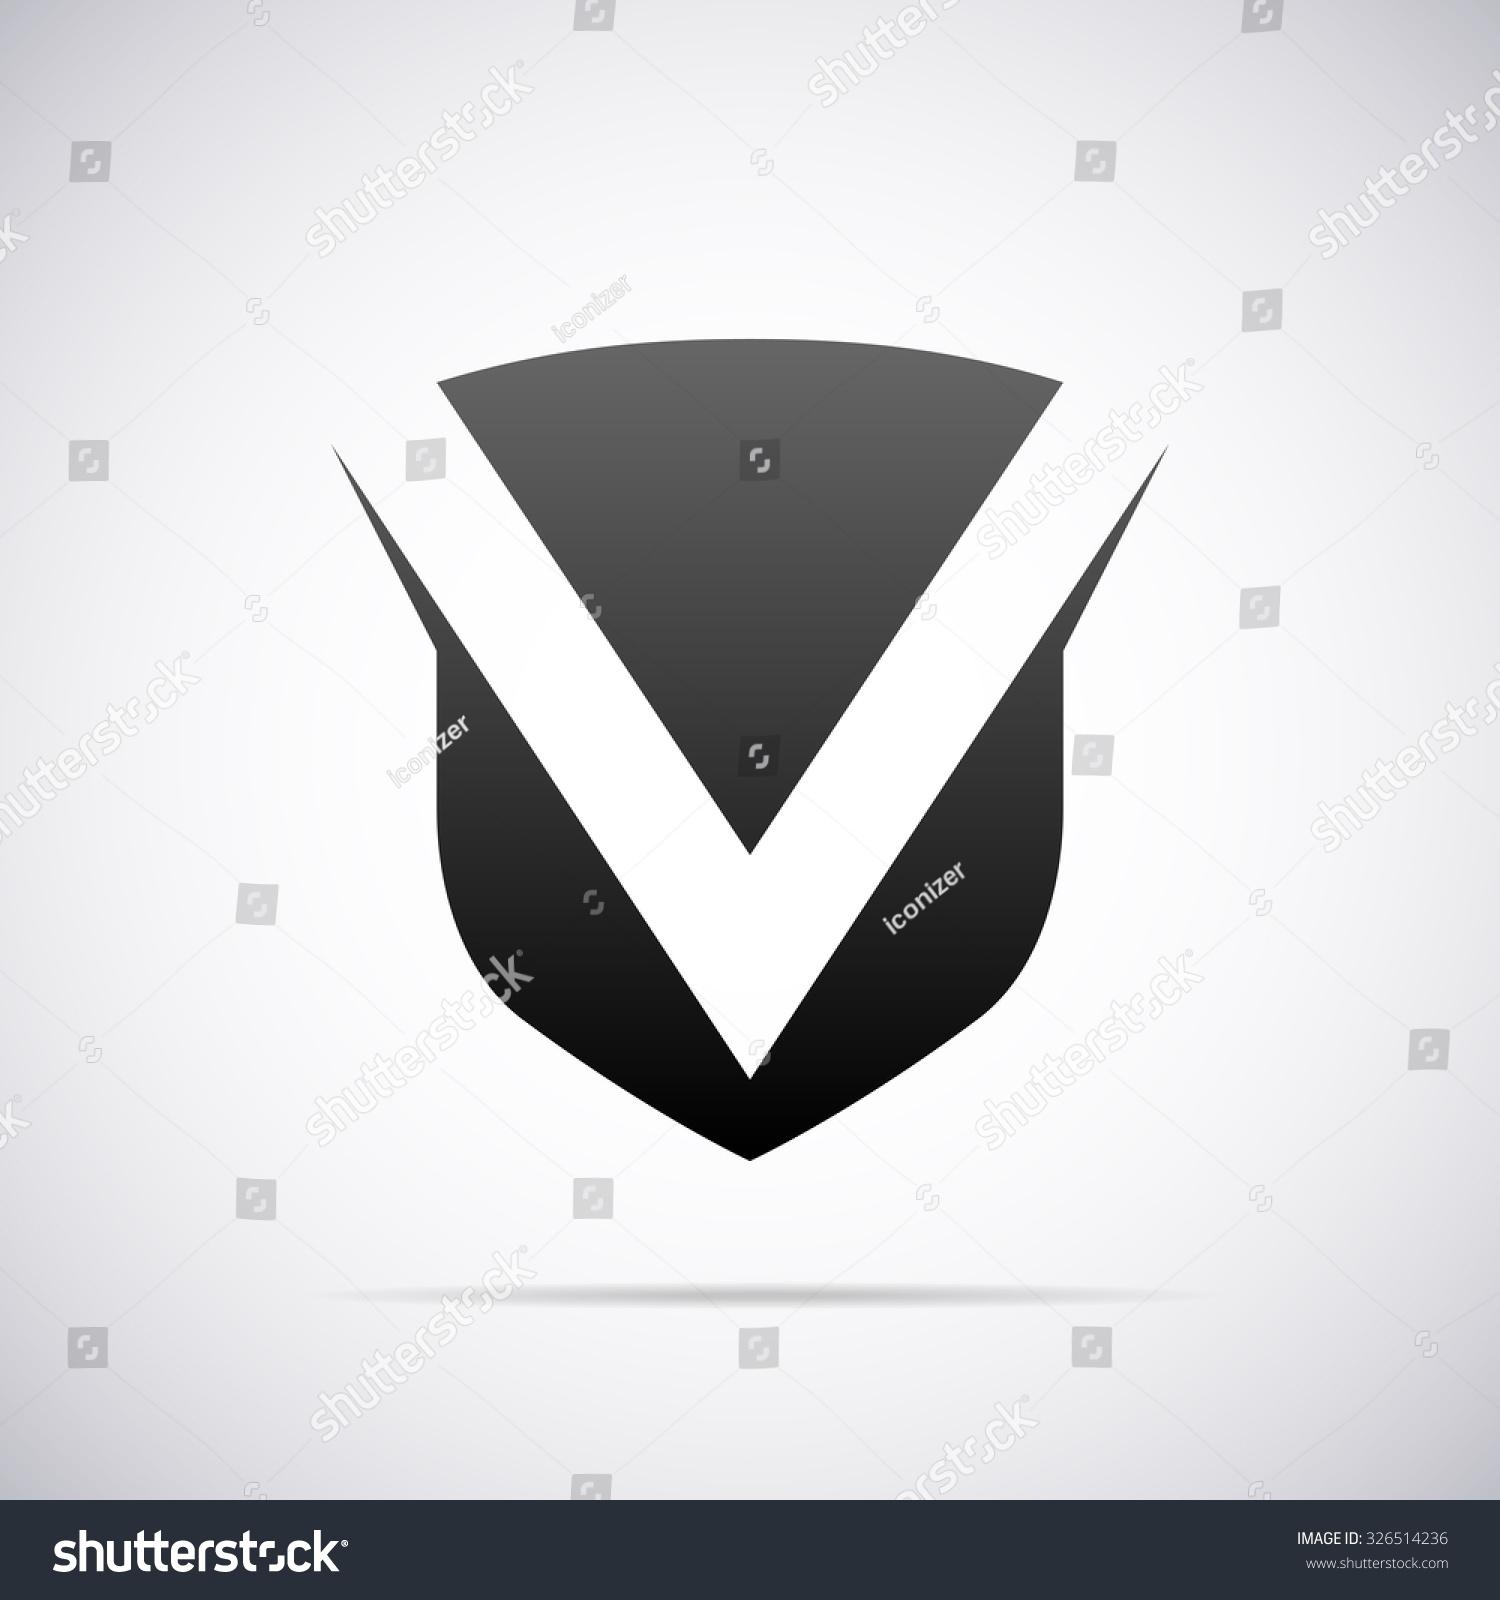 logo letter v design template のベクター画像素材 ロイヤリティ